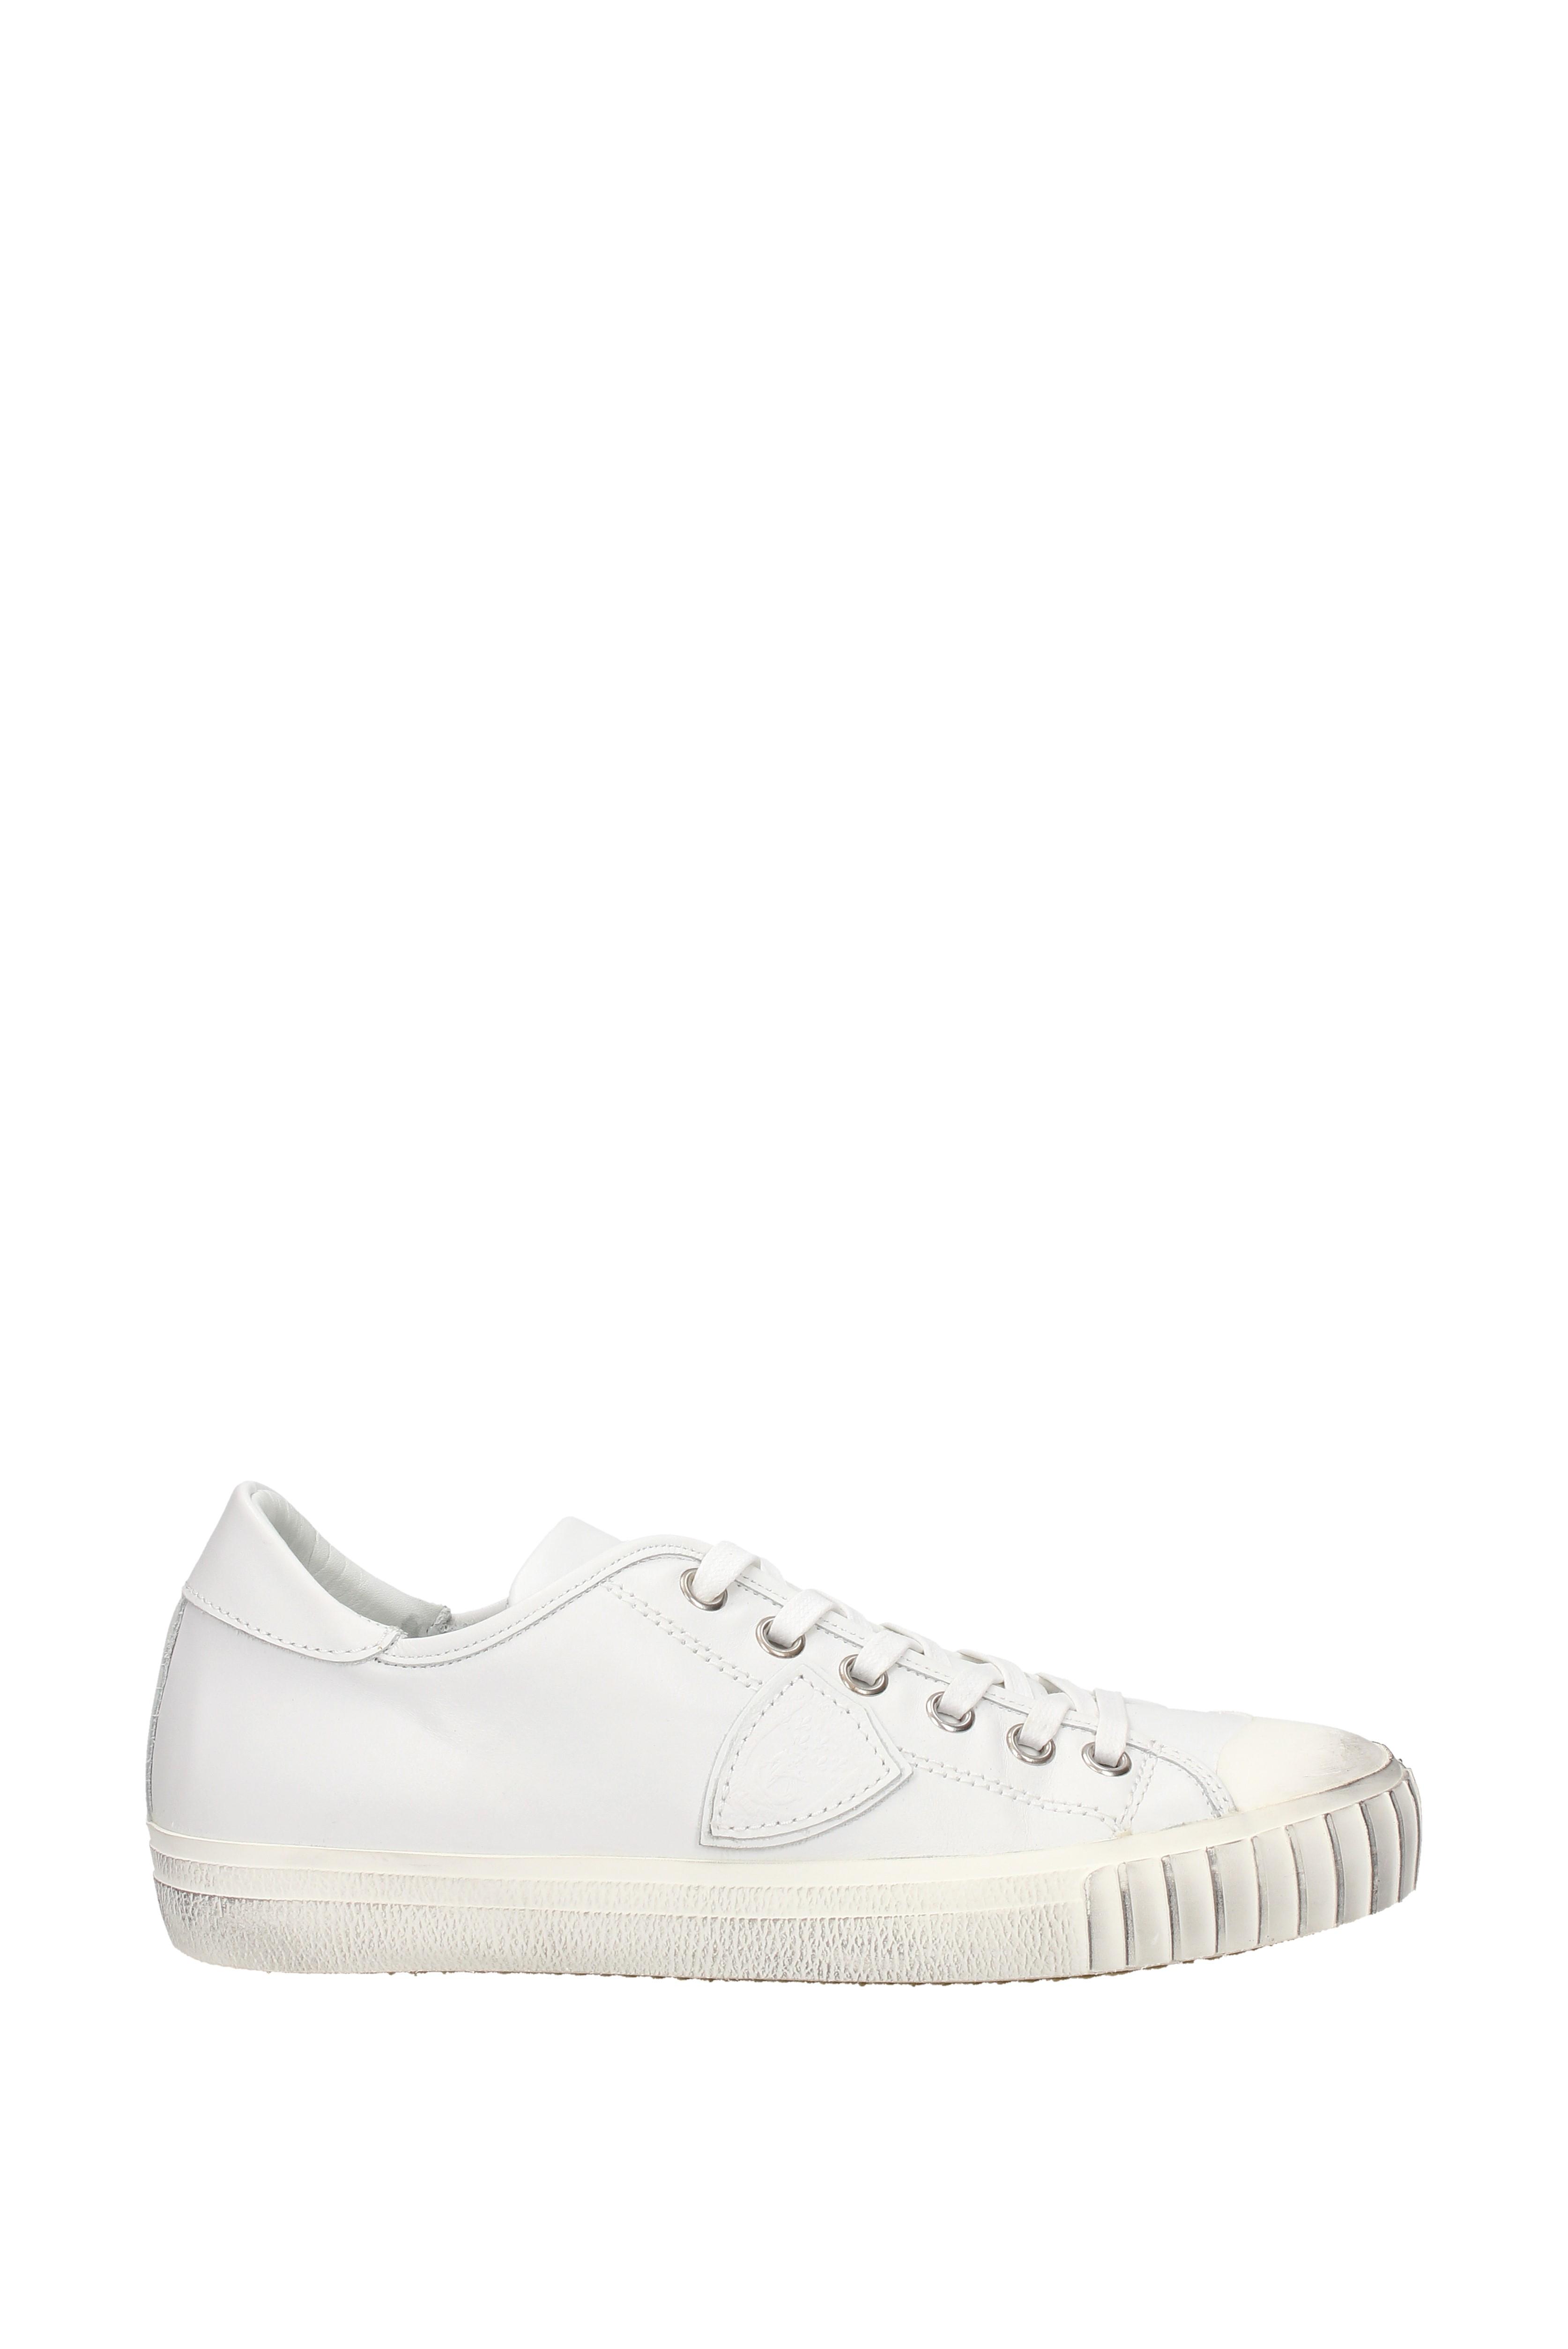 Sneakers - Philippe Model gare Herren - Sneakers Leder (GRLUV0) 21b8bd